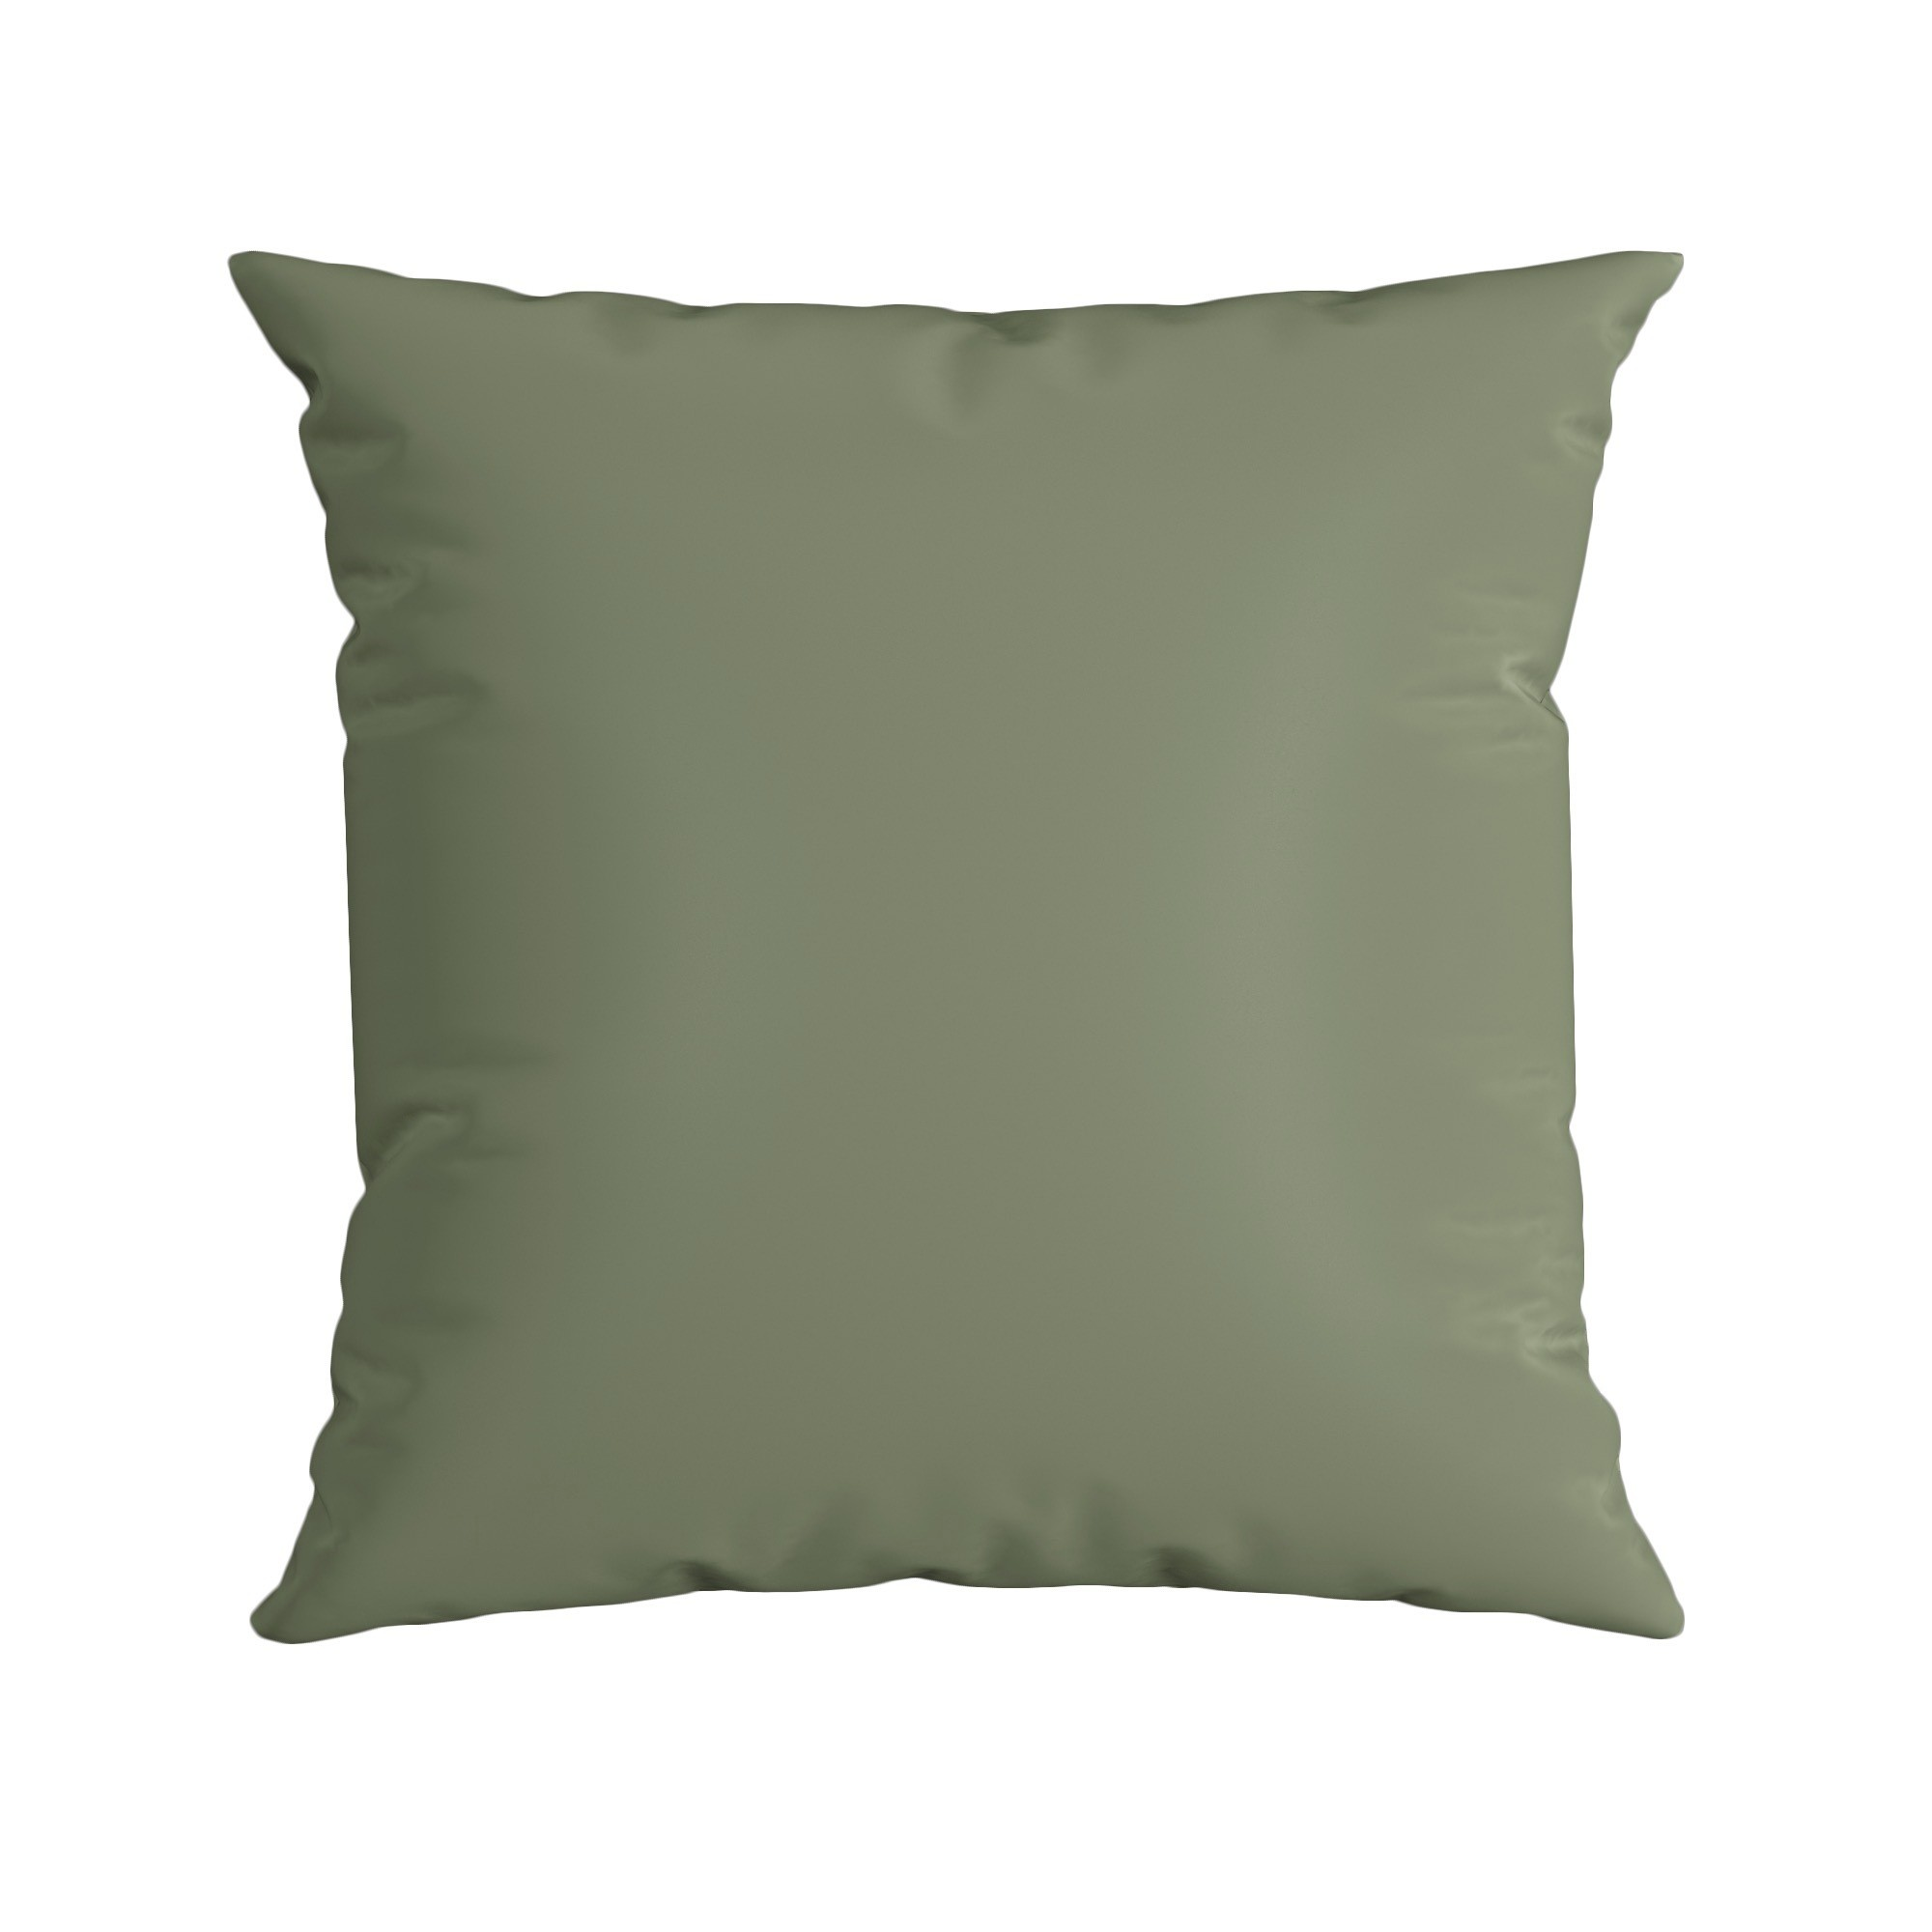 Almofada Elegance 43x43cm Verde Lisa - Belchior